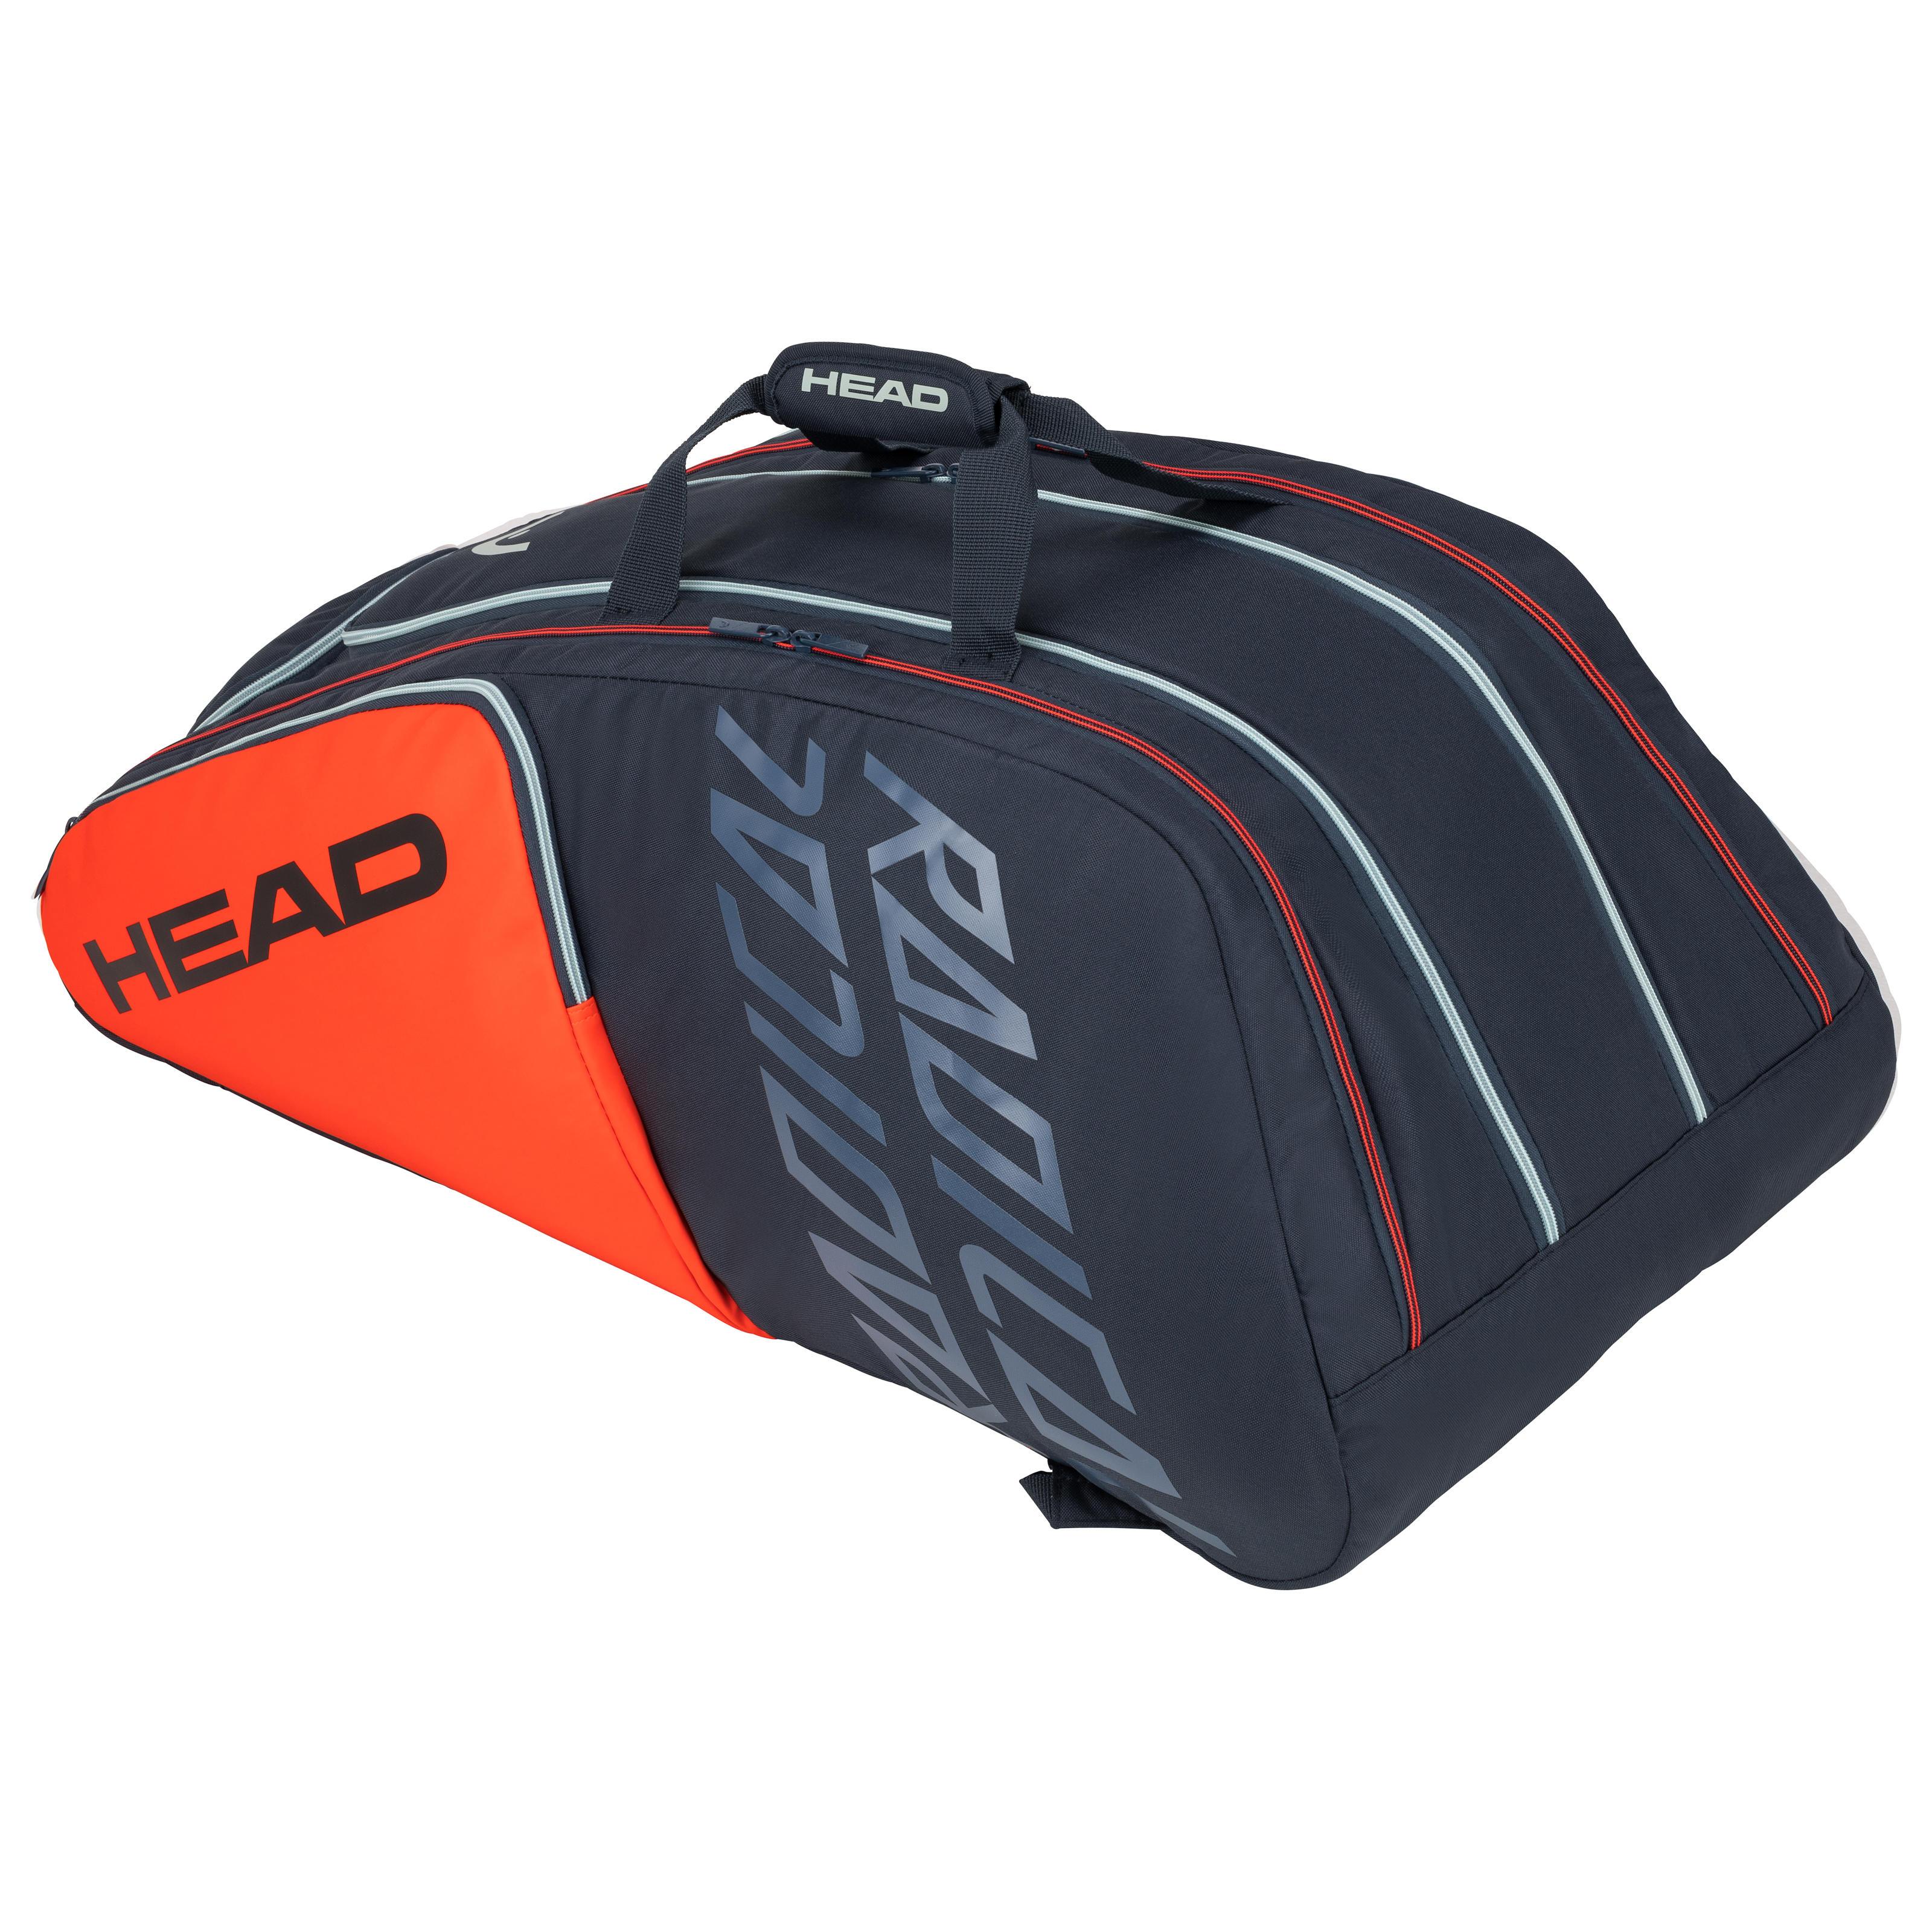 Head Elite Backpack Bolsa de Tenis Adultos Unisex Negro//Blanco Talla /única